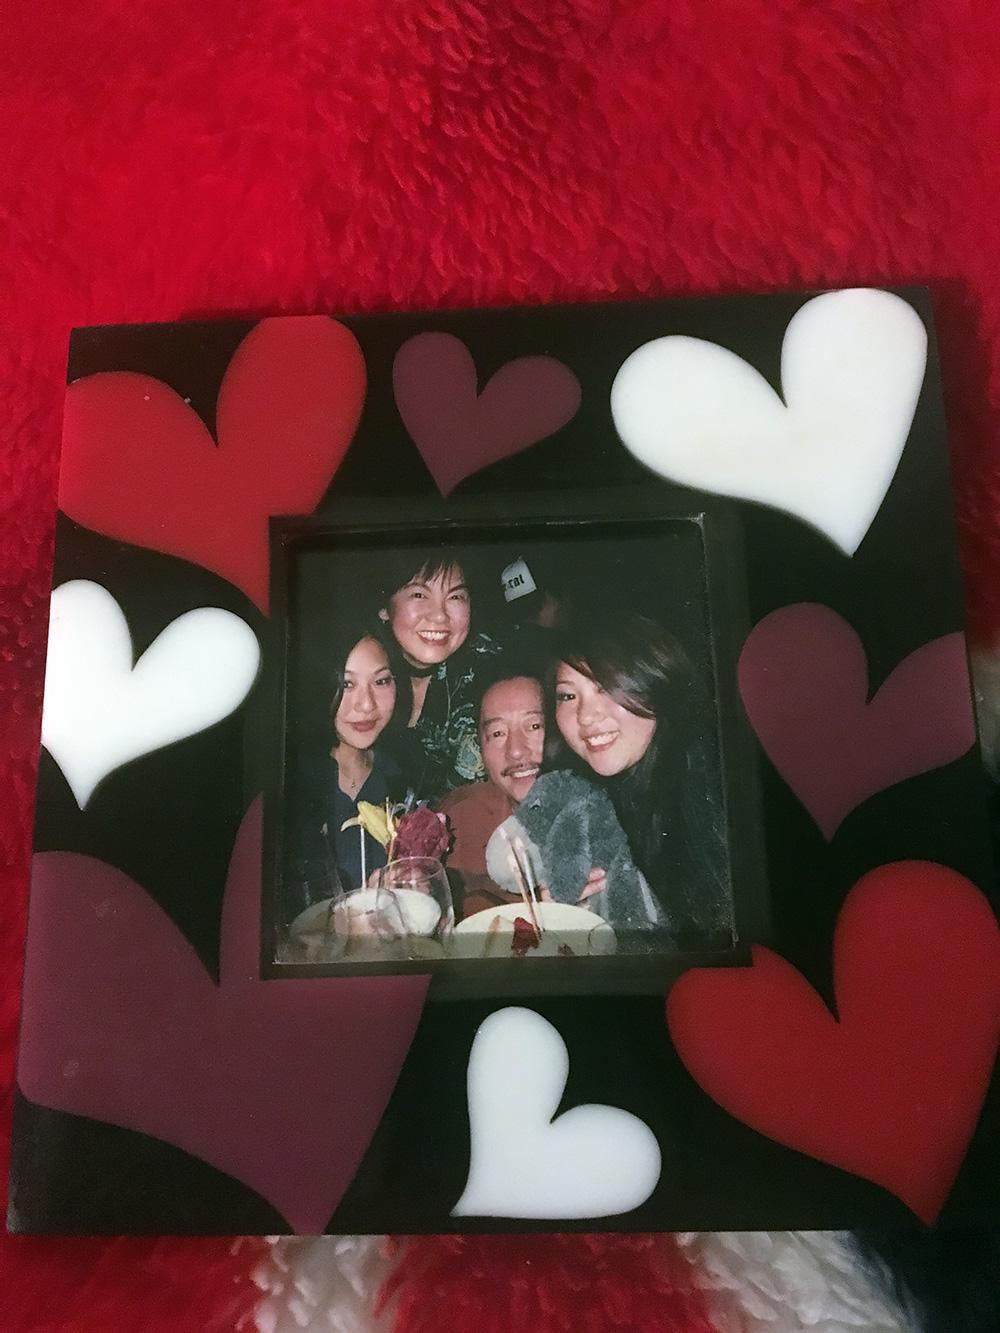 Komiyama Family; Sayaka, Mimi, Shigemi, Erika